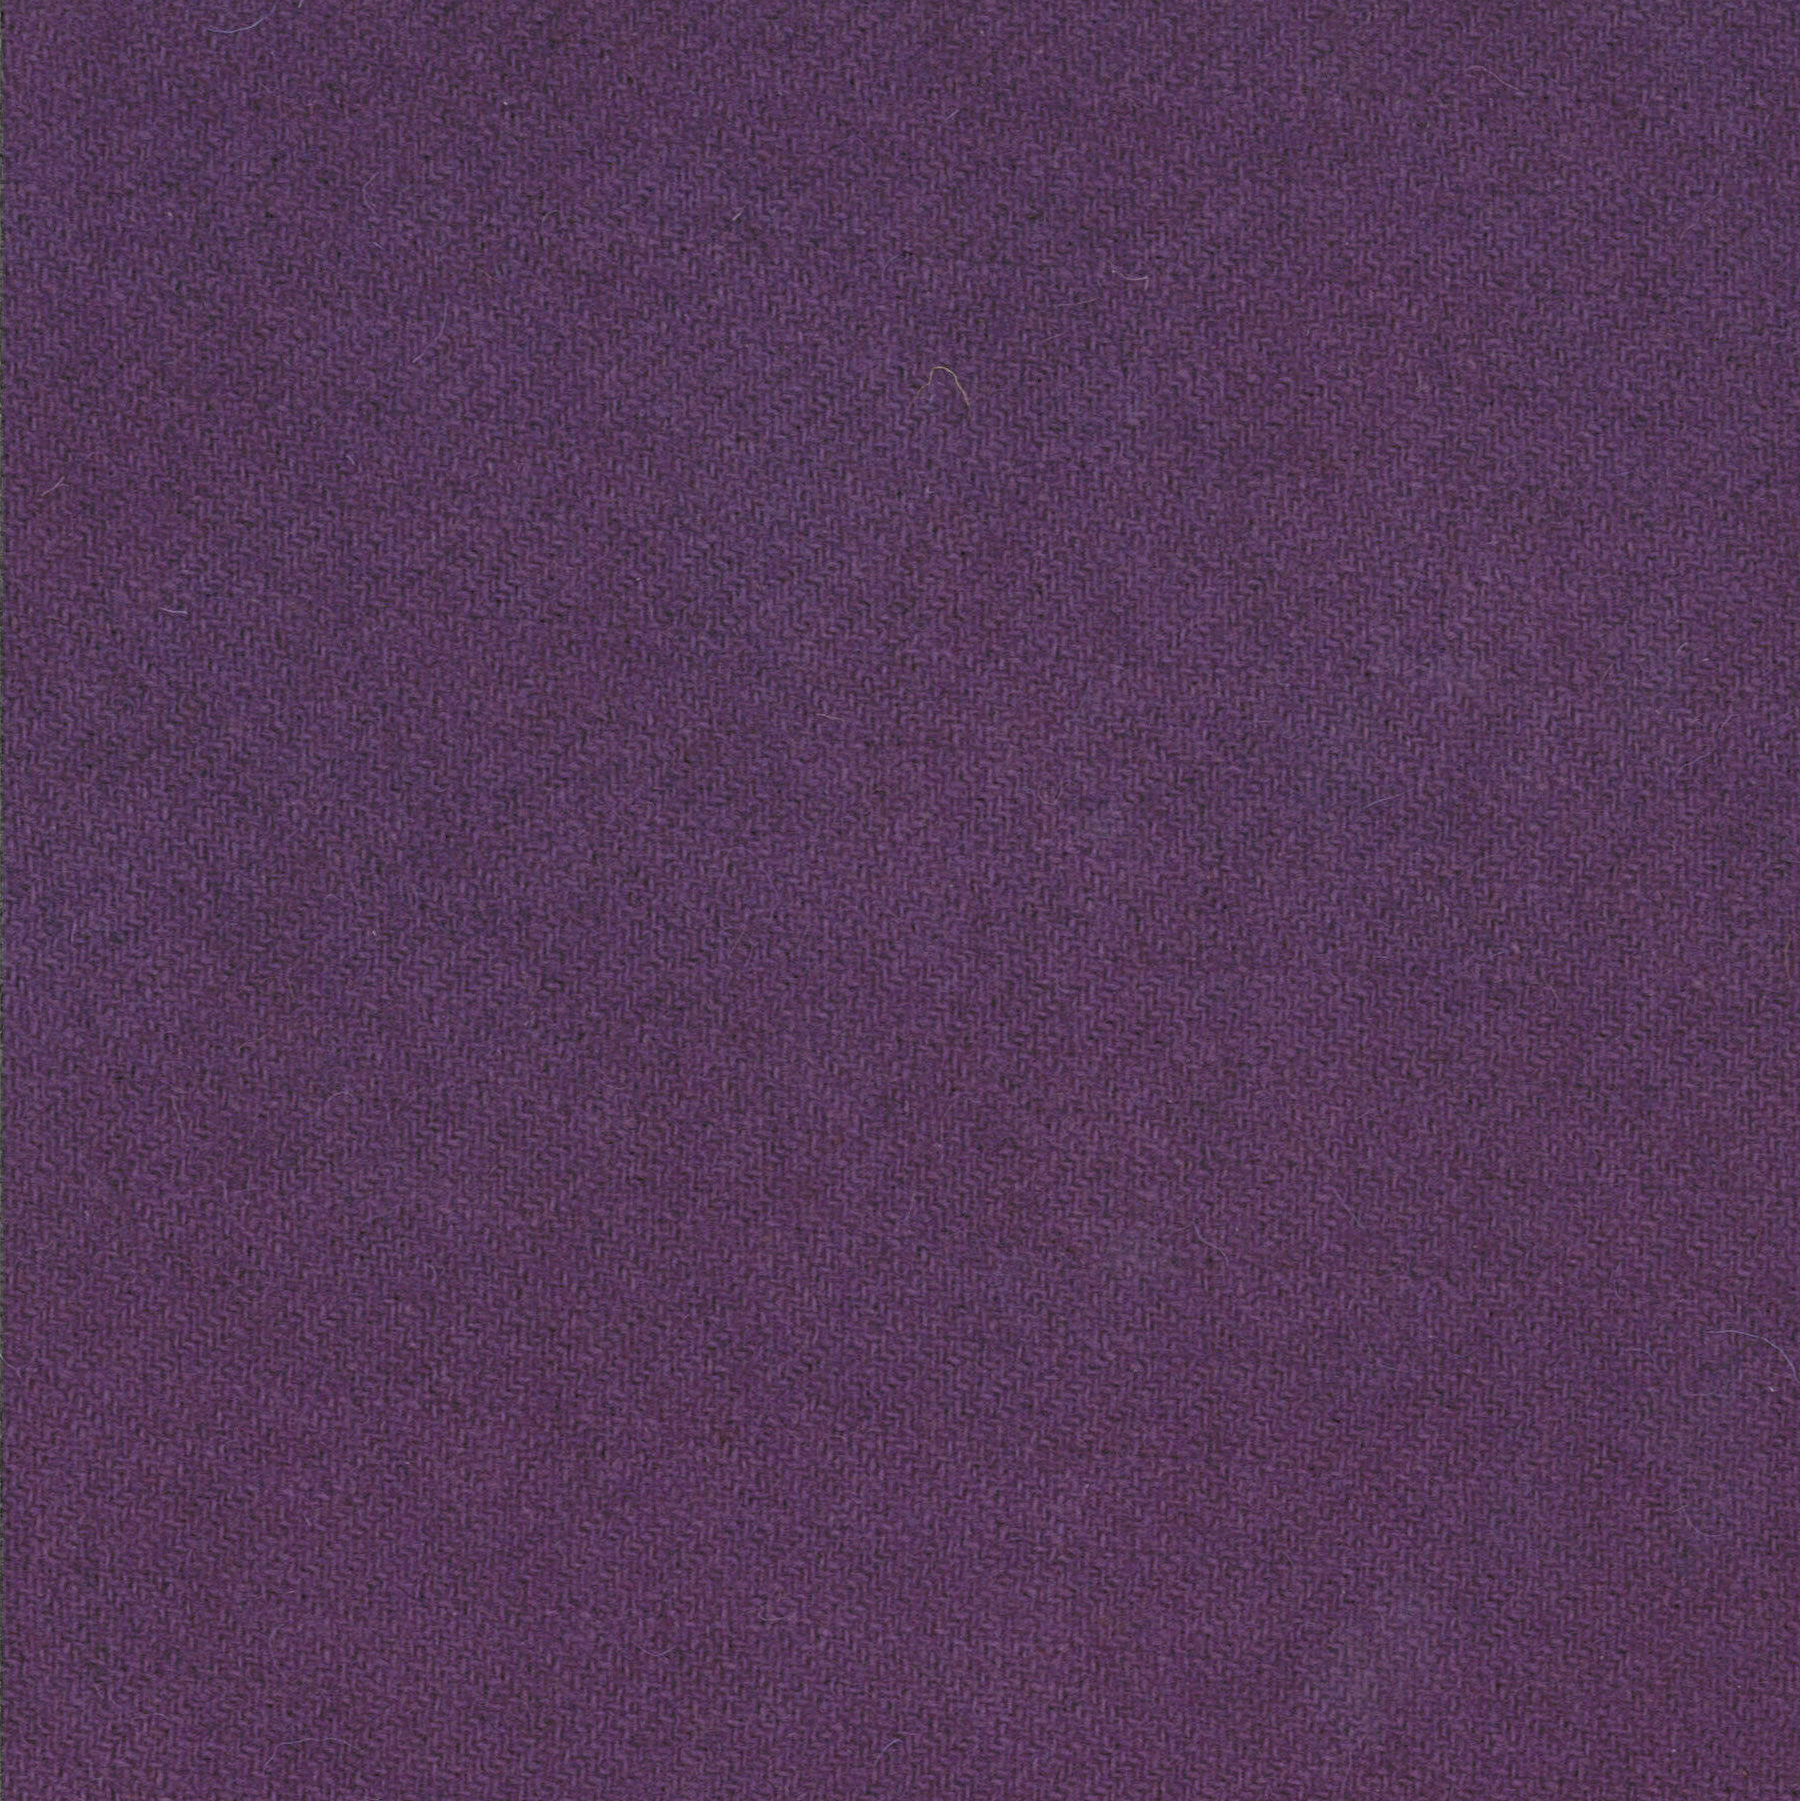 PRI 5167 Wool Amethyst 15 x 25